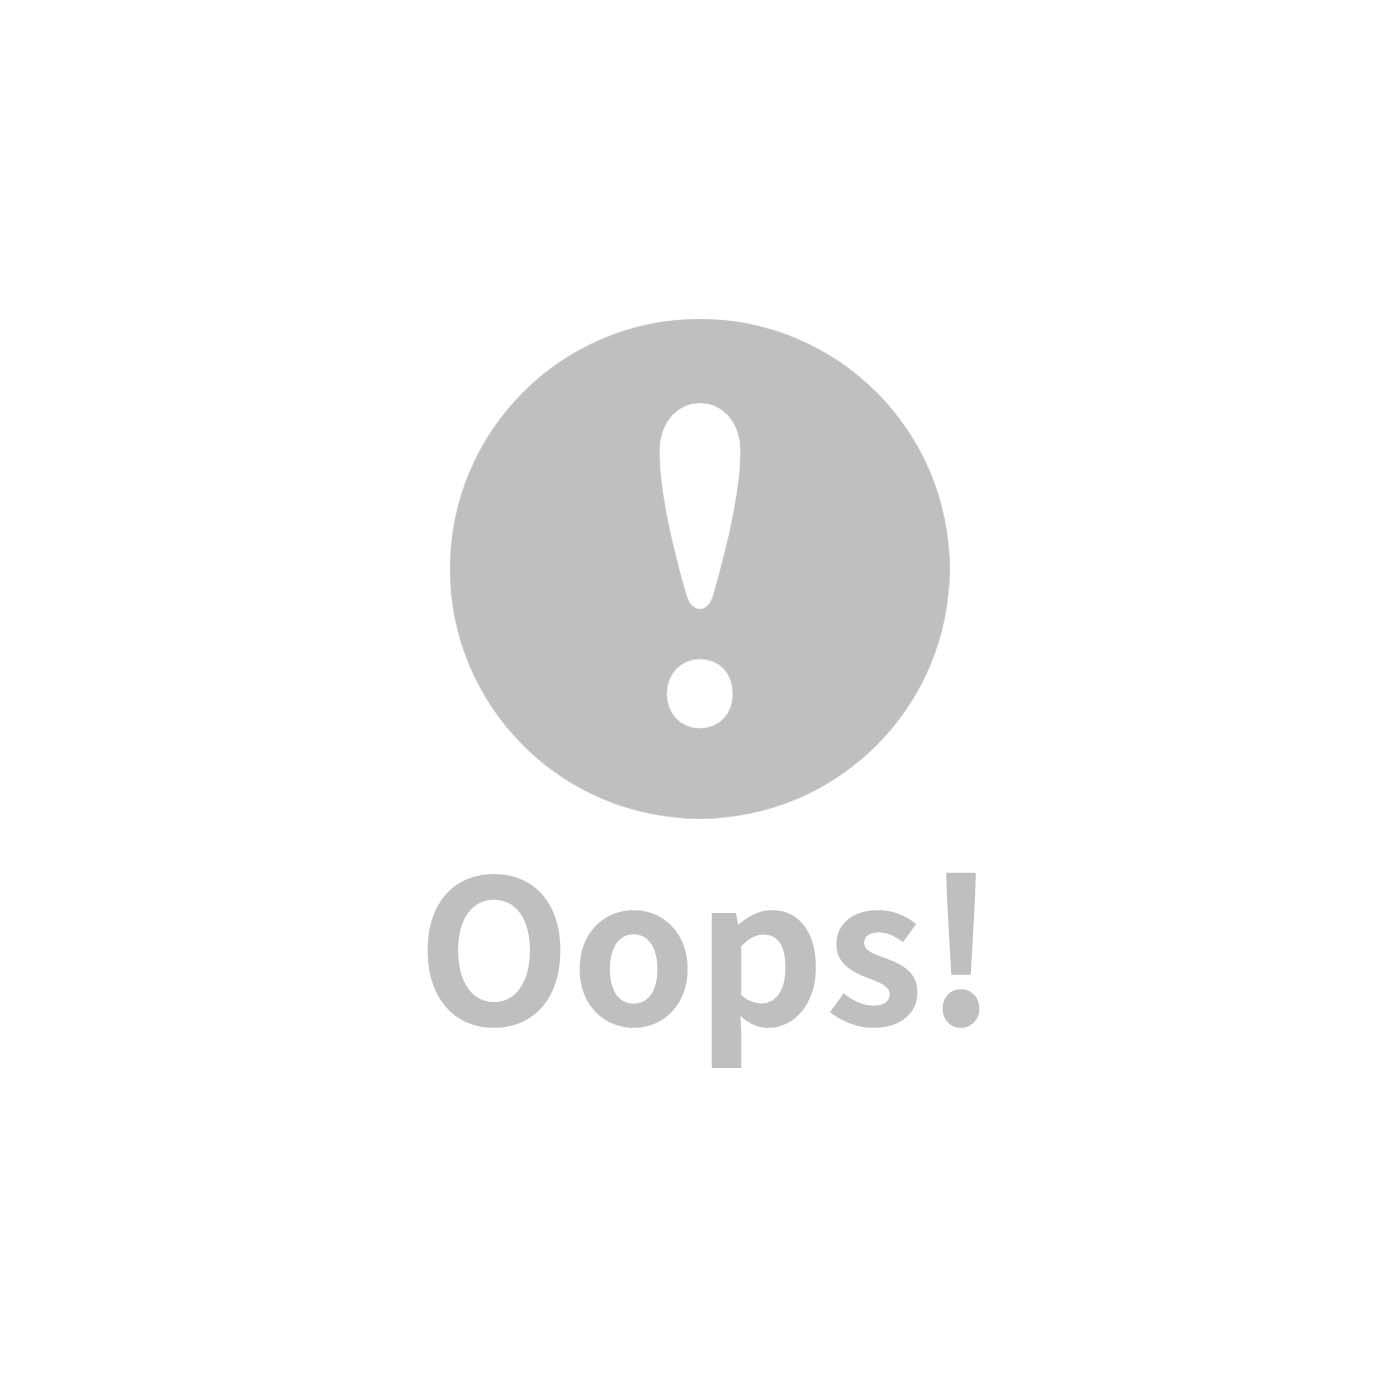 La Millou Velvet頂級棉柔系列-嬰兒睡窩/床-天堂鳥花園(舒柔墨綠)